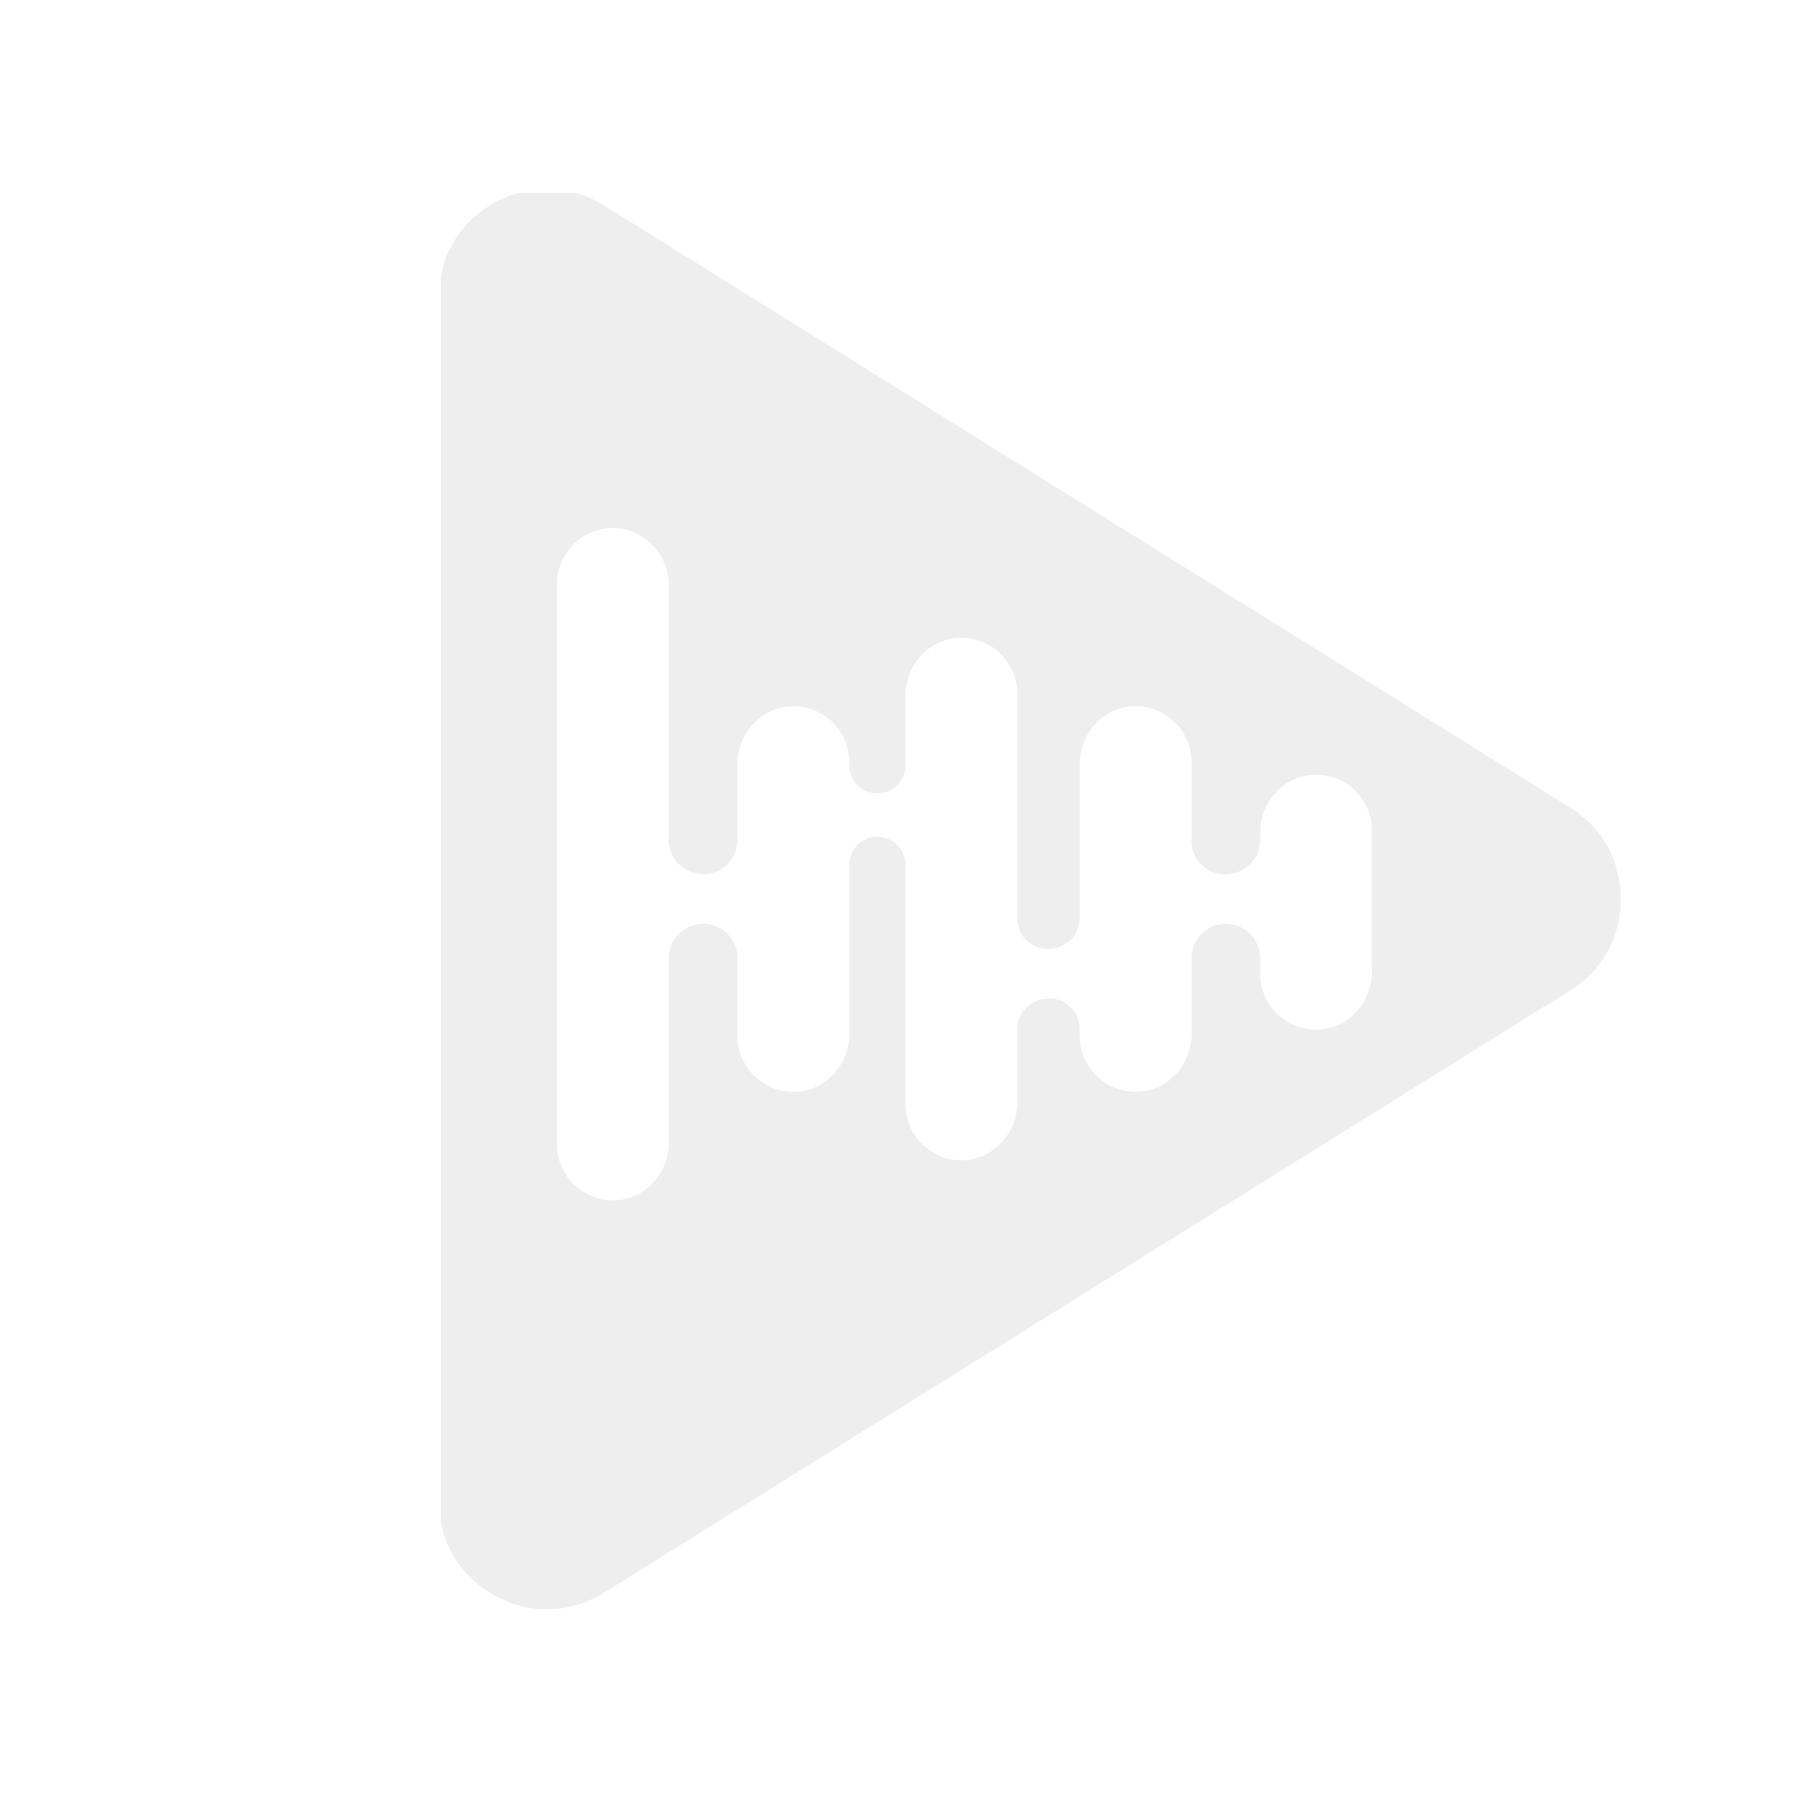 Klipsch RB-41 II - Stativ/bokhyllehøyttaler, 4